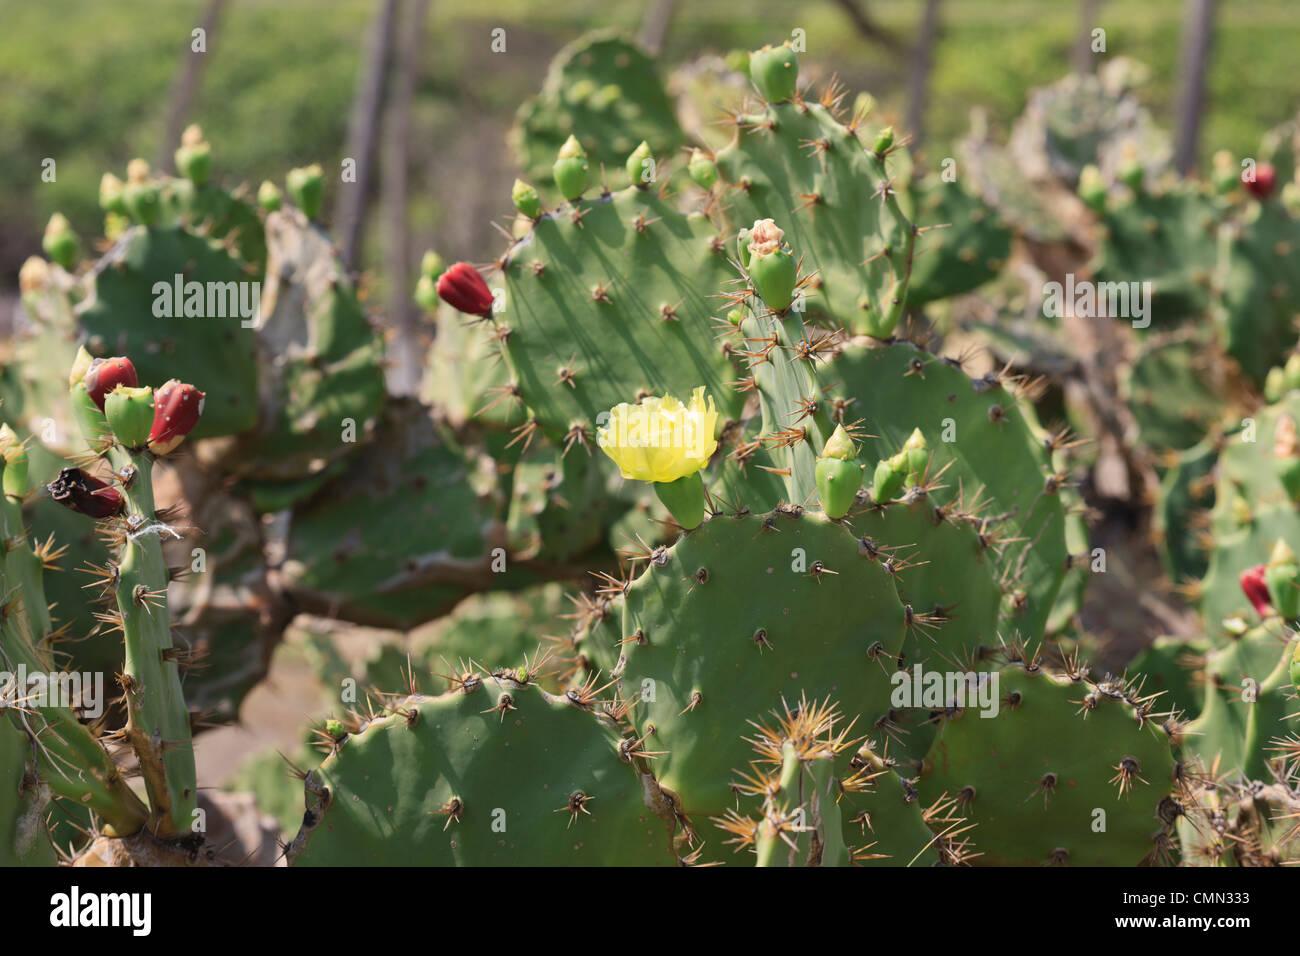 Cactus with flowers, Camaratuba, Paraiba, Brazil, Brasil Stock Photo